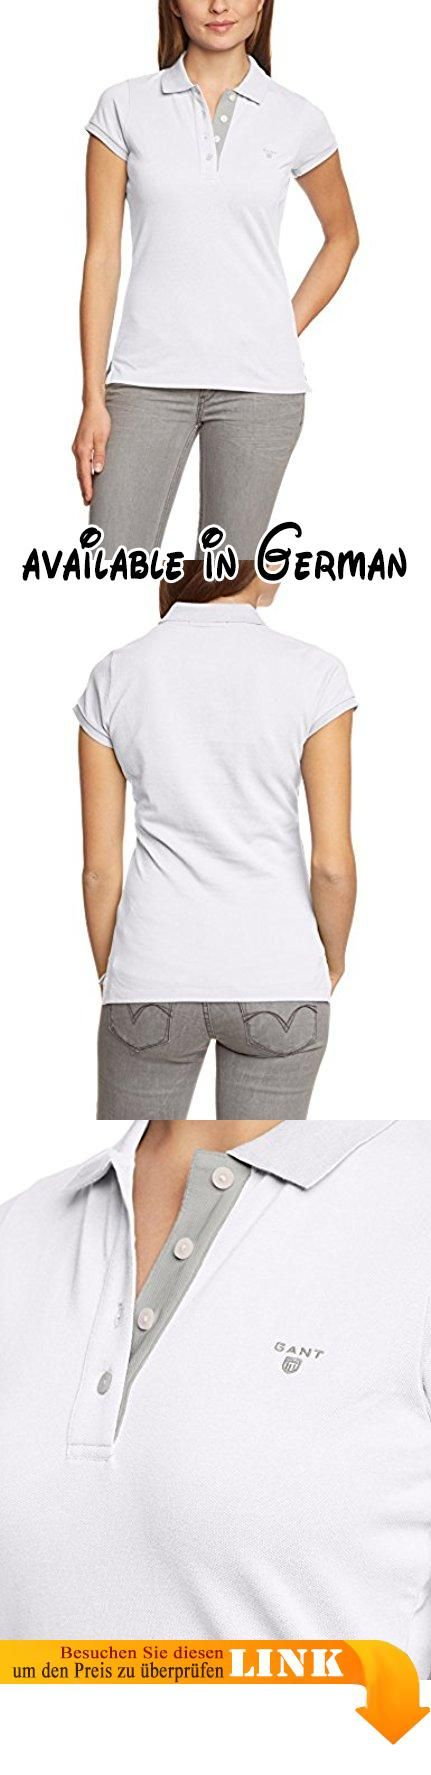 GANT Damen Poloshirt FITTED CONTRAST PIQUE, Einfarbig, Gr. 44 ...